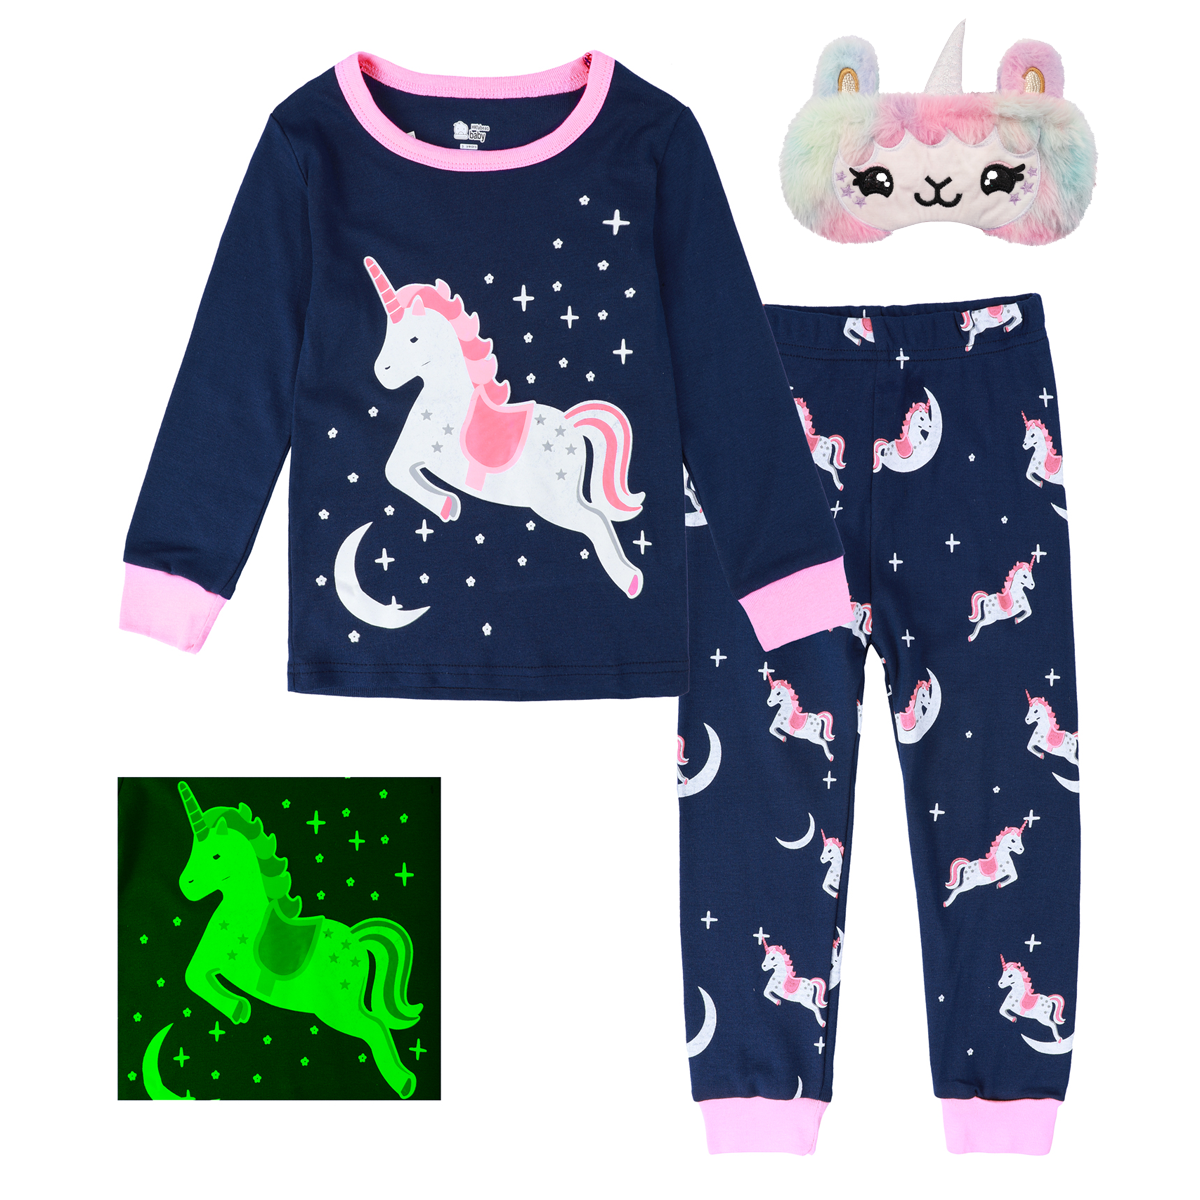 Kids Girls Unicorn Pajamas Set Children Cotton Sleepwear Toddler Casual Mermaid Nightwear Infant Cute Homewear Clothes 2-8Y